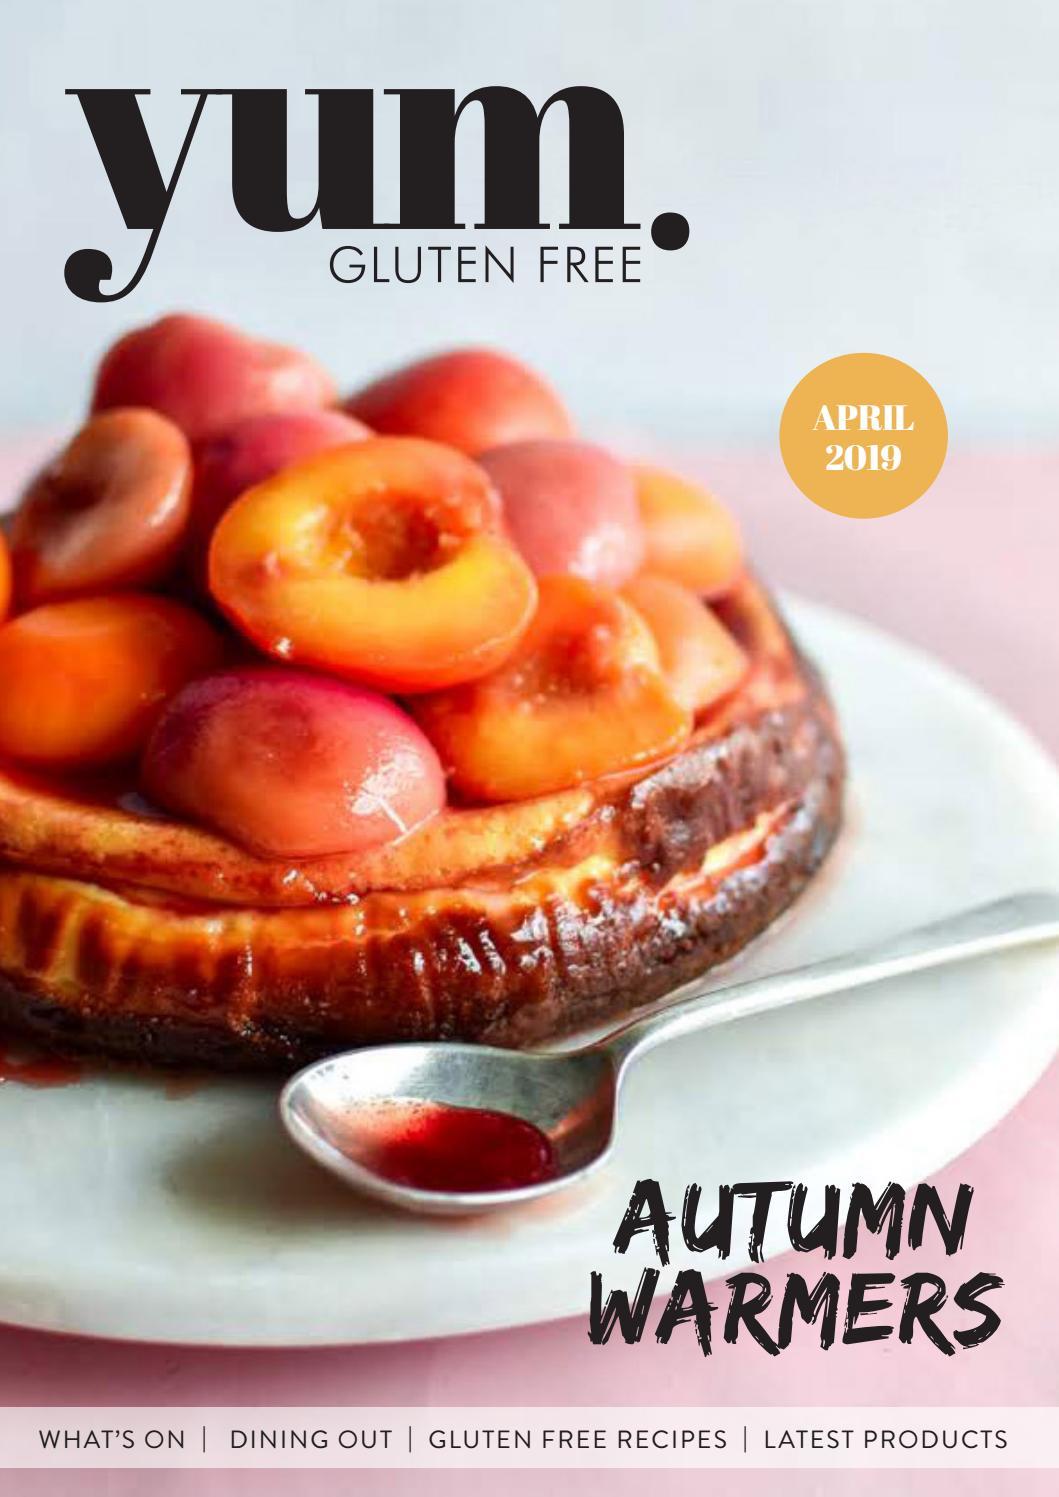 Yum Gluten Free Magazine Autumn 2019 By Yum Gluten Free